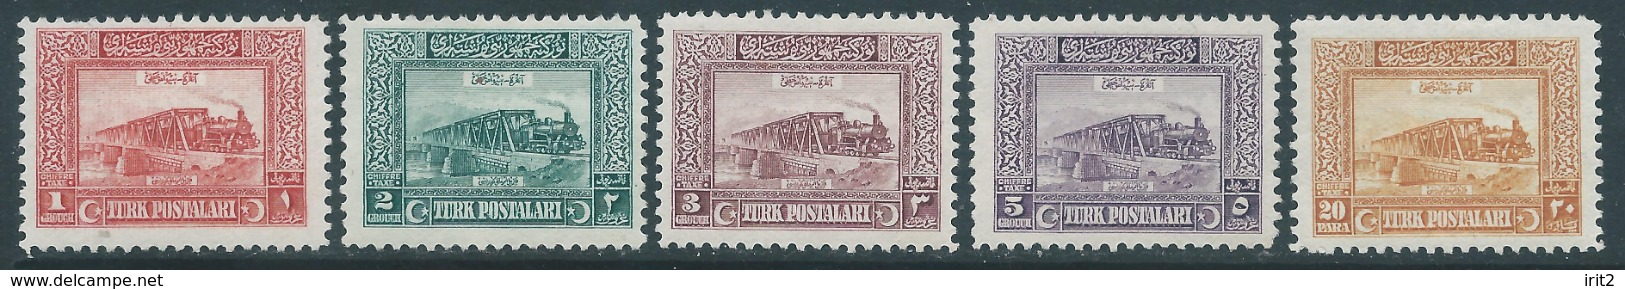 Turchia Turkey Republic 1926 Written In Arabic And Latin,original Gum,High Value, Rare - 1921-... Republic